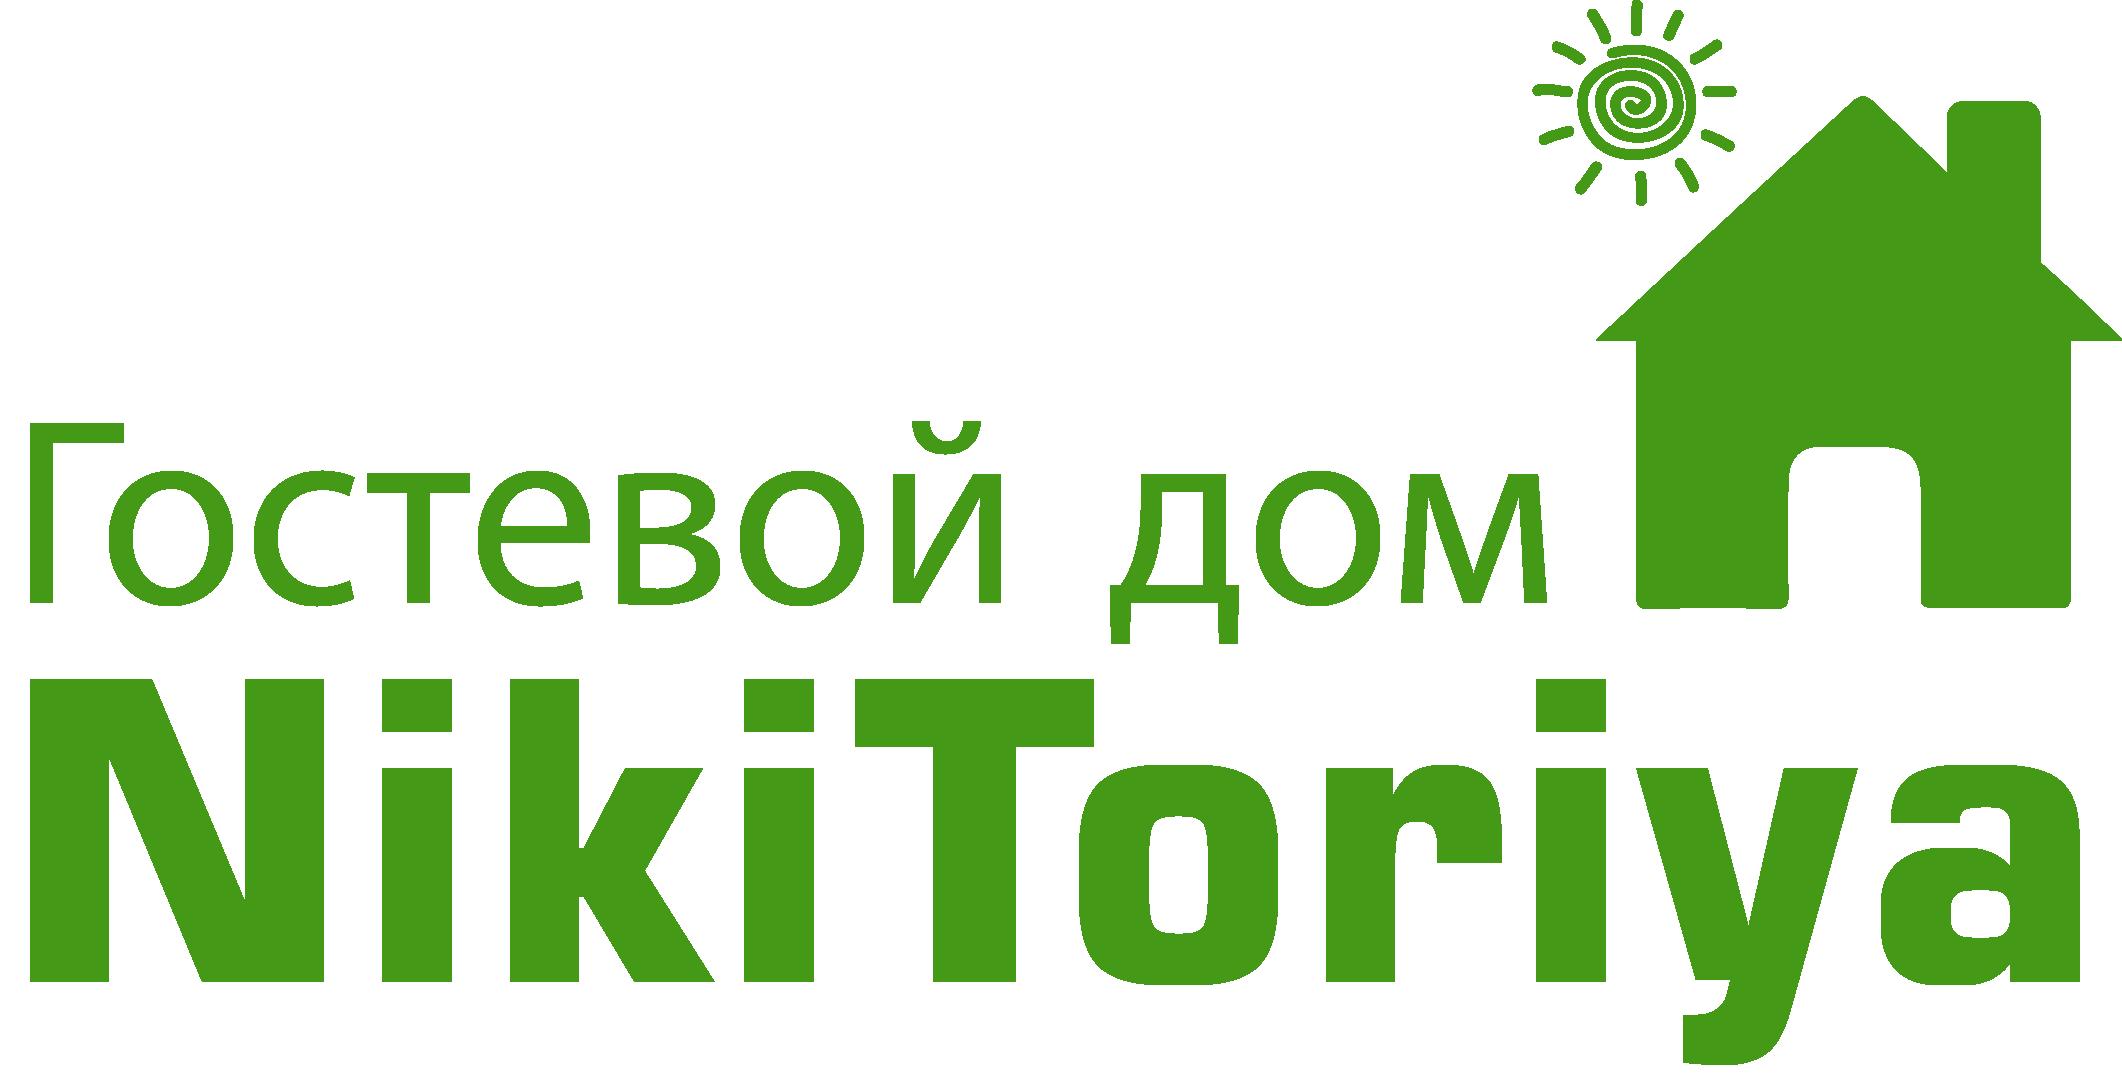 NikiToriya